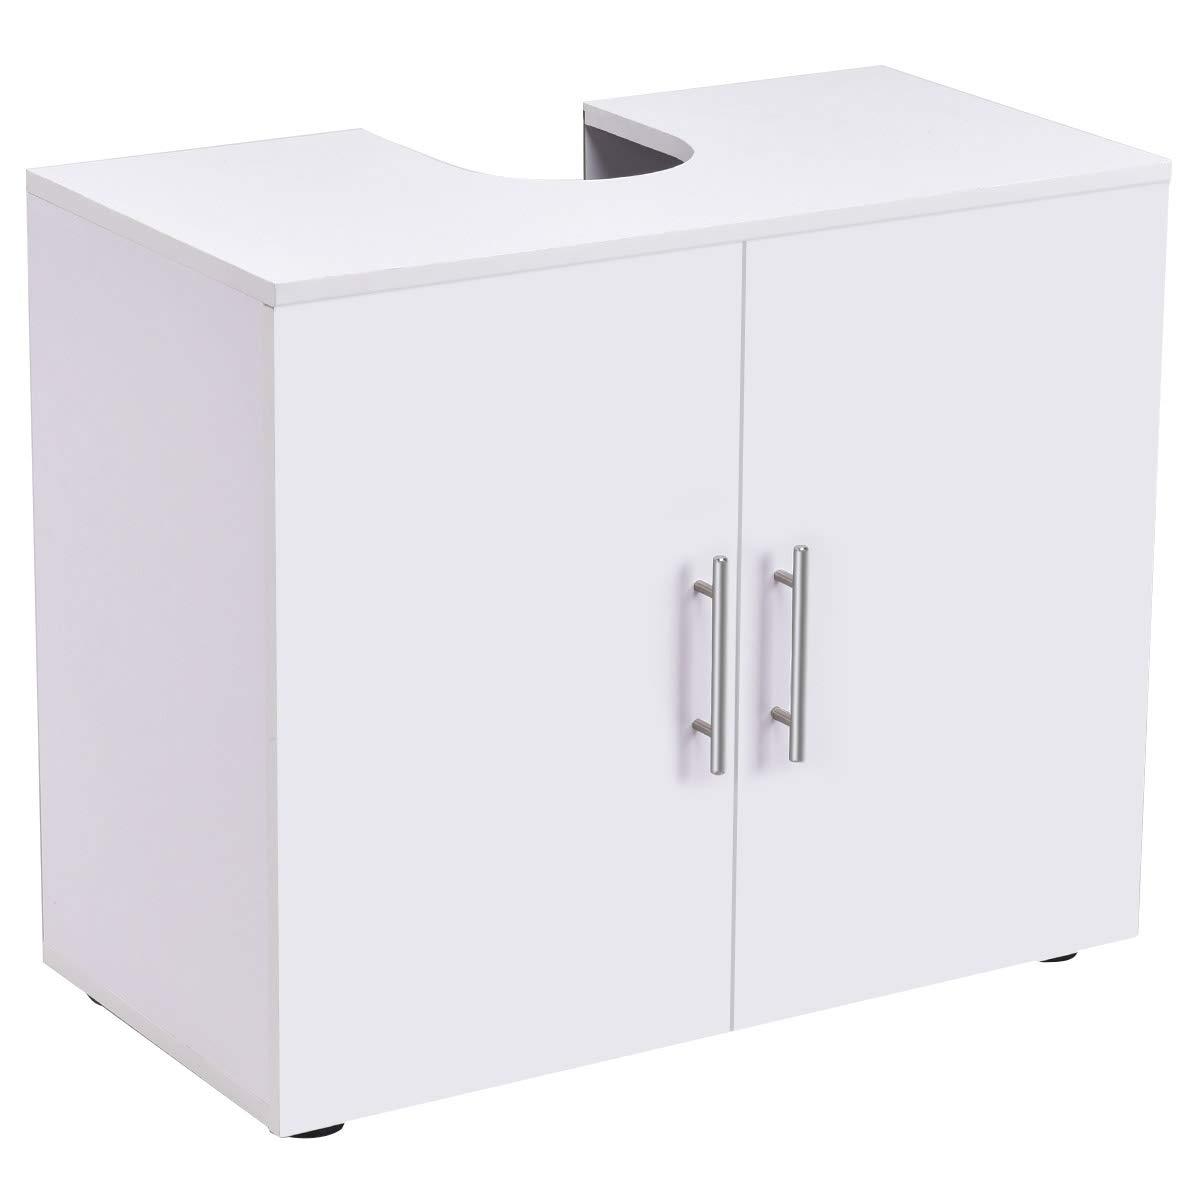 Bathroom Non Pedestal Under Sink Vanity Cabinet Multipurpose Freestanding Space Saver Storage Organizer Double Doors with Shelves, White by WATERJOY